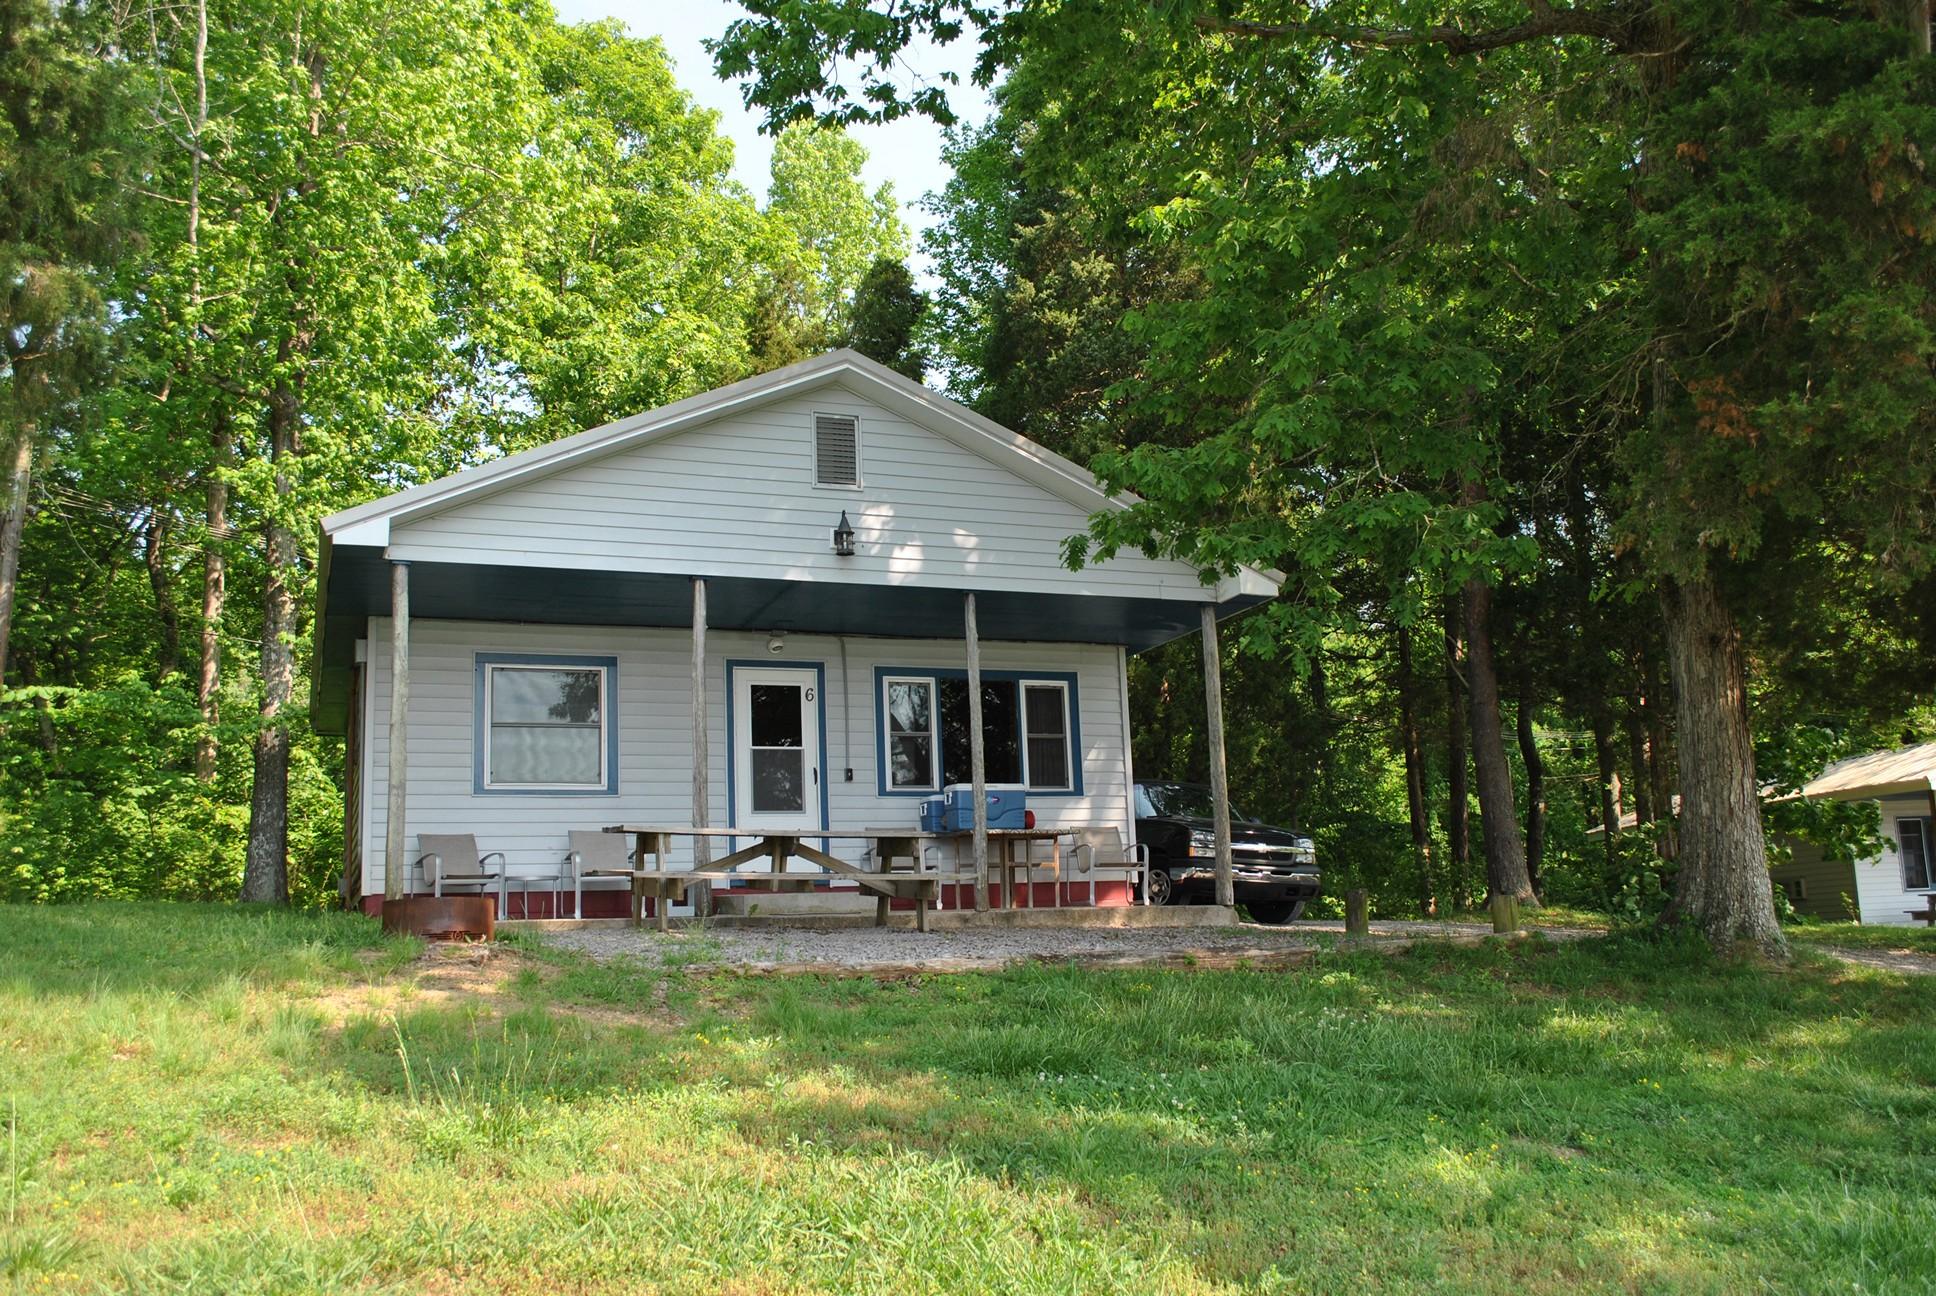 2 bedroom cabins for Piney shores resort cabine